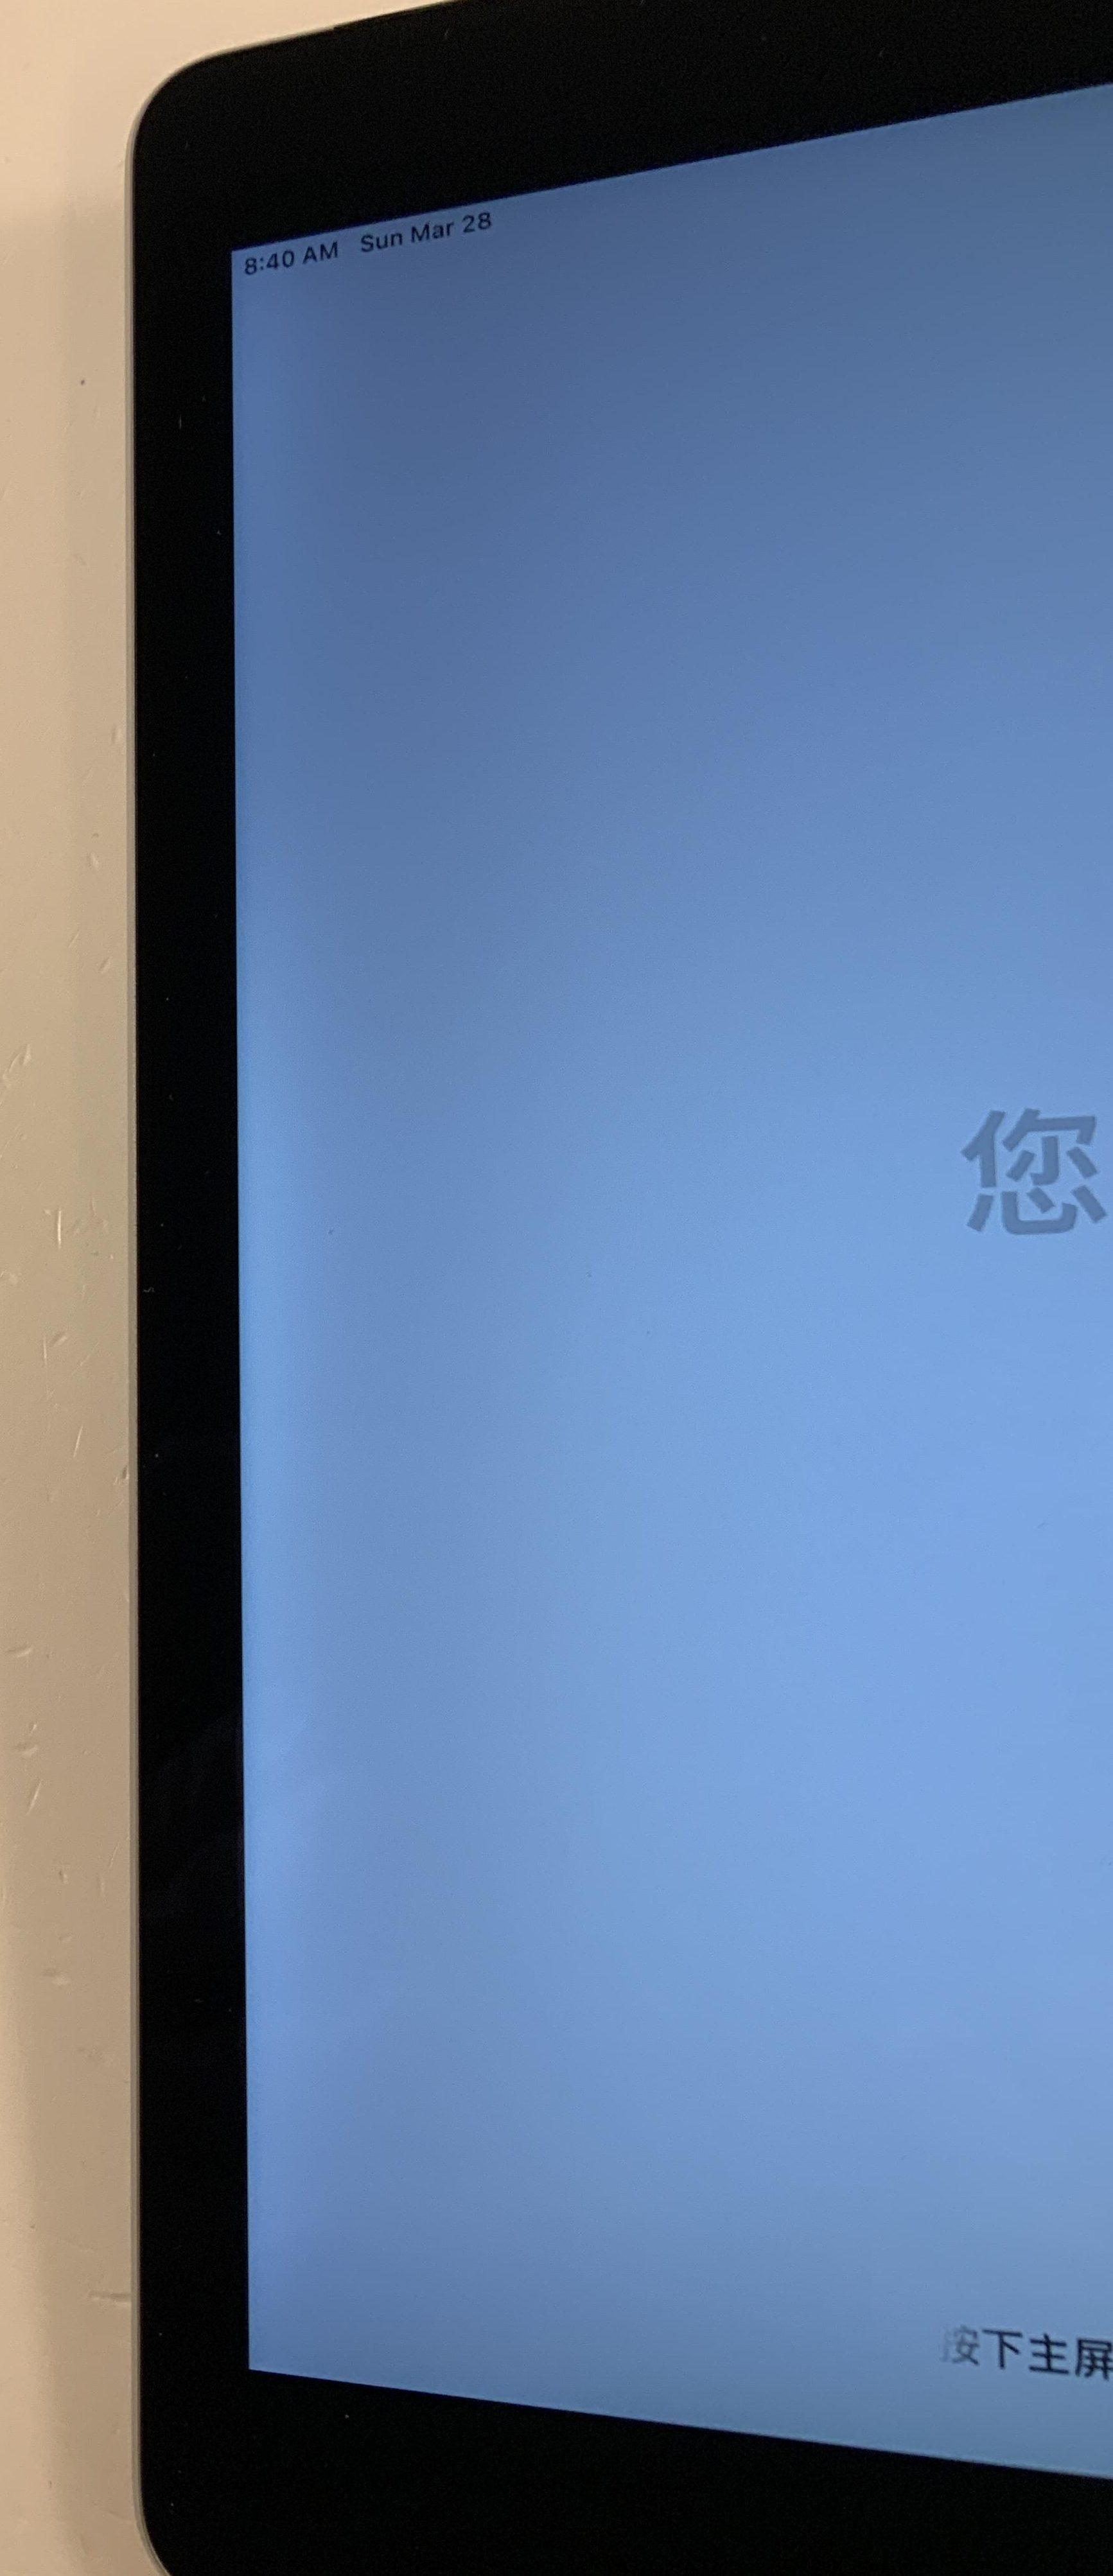 iPad Air 2 Wi-Fi + Cellular 64GB, 64GB, Space Gray, immagine 4